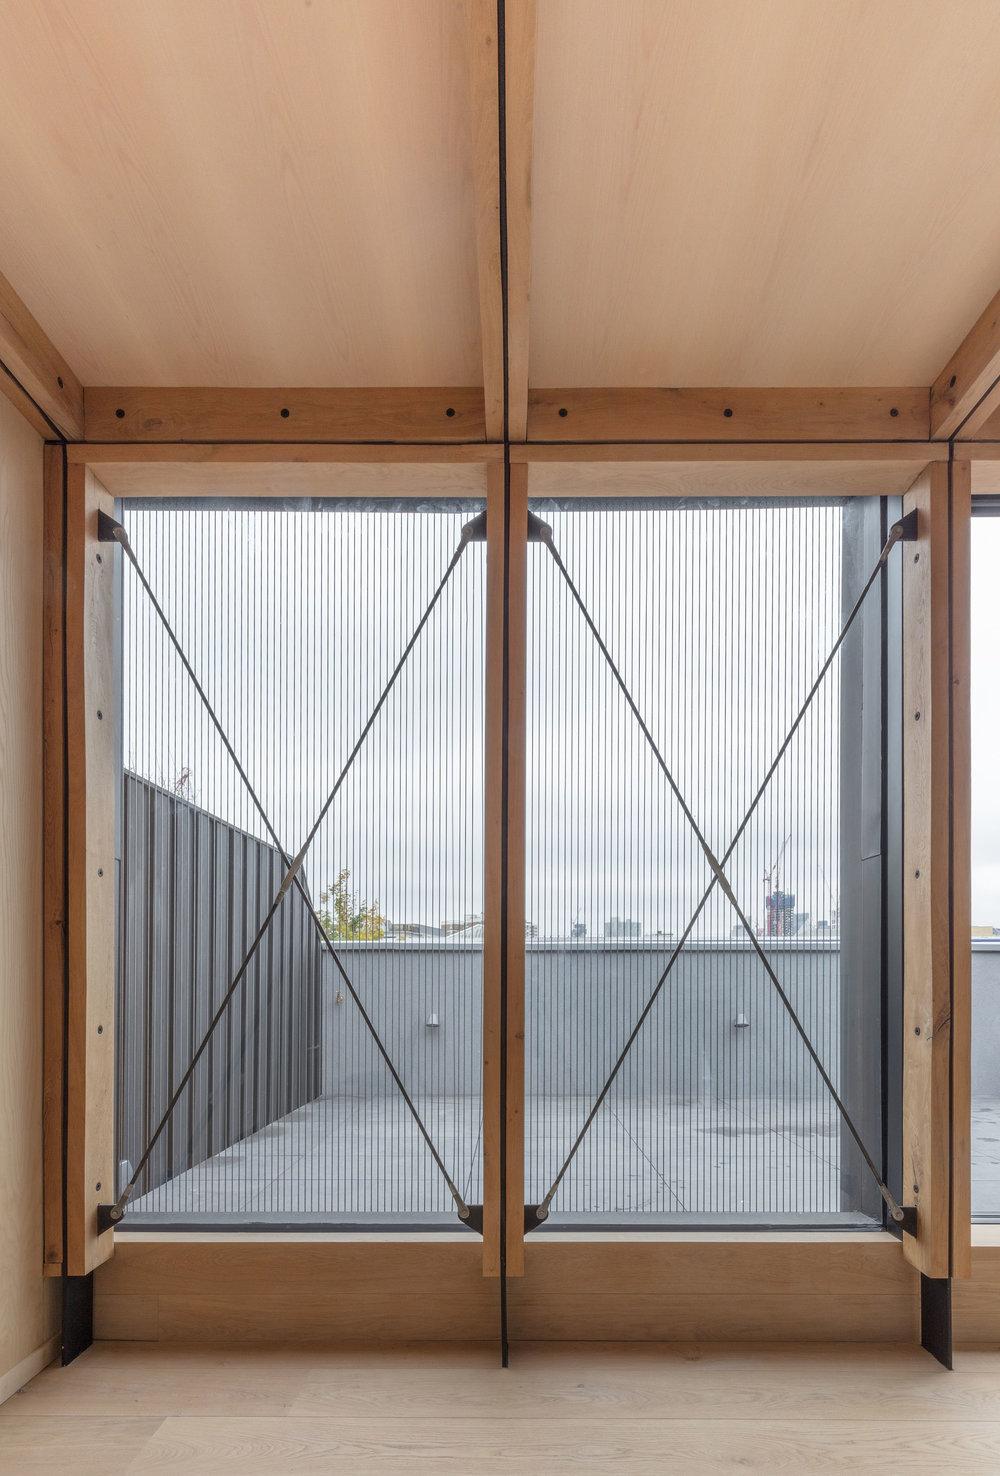 Union-Wharf-Islington-London-Timber-Oak-Ash-Roof-Extension-Cross-Bracing-Residential-Architect.jpg